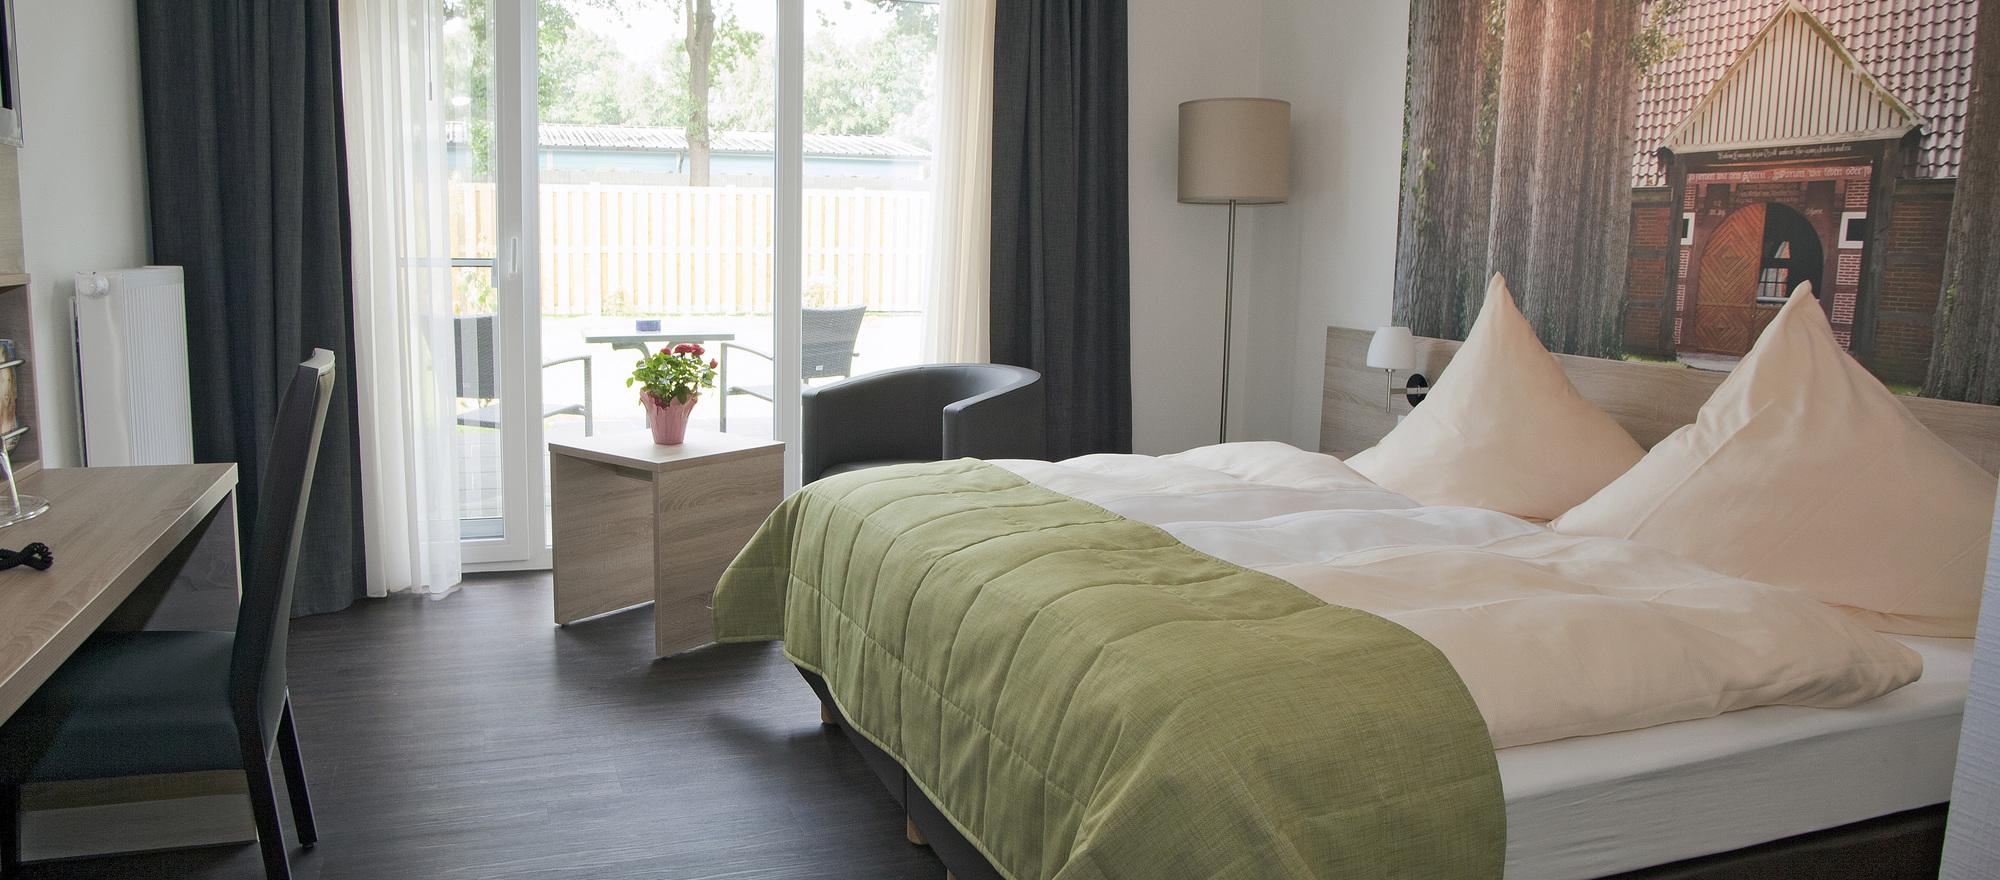 Ringhotel alfsee piazza in rieste niedersachsen ringhotels for Design hotel niedersachsen